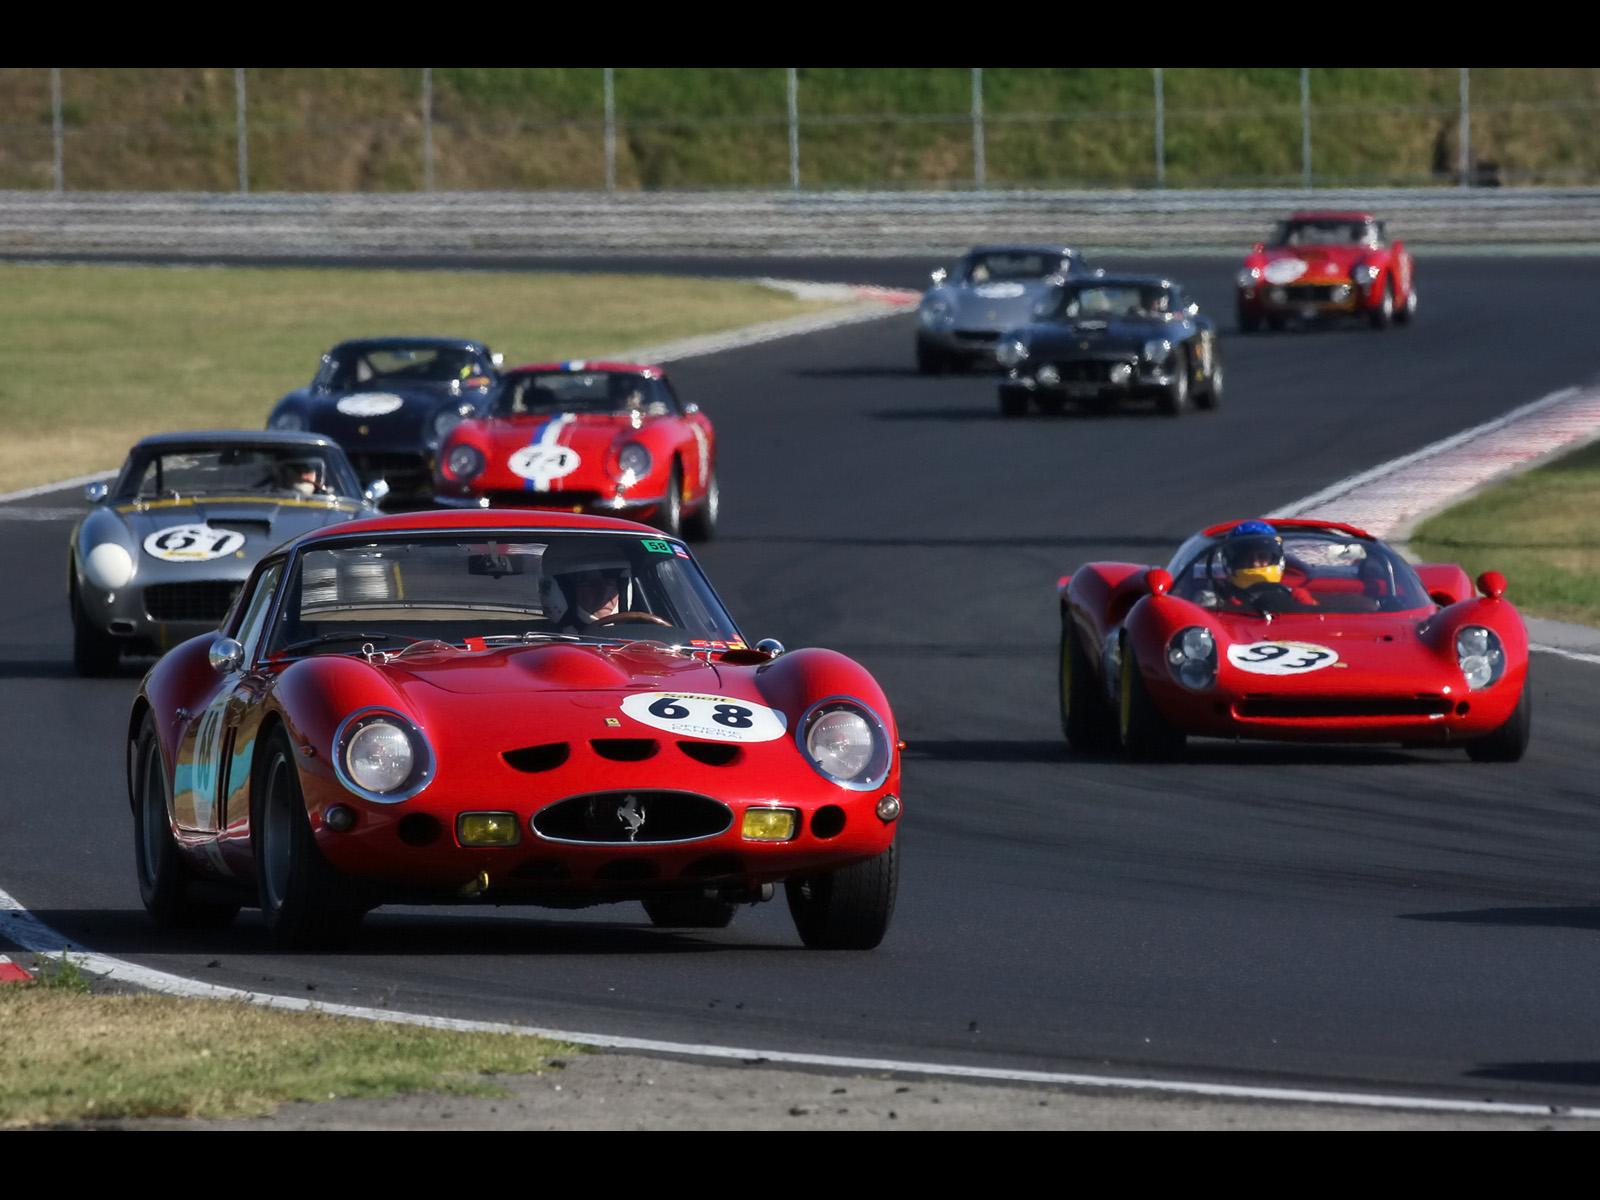 Ferrari 250 Gto Wallpaper - Race Car , HD Wallpaper & Backgrounds